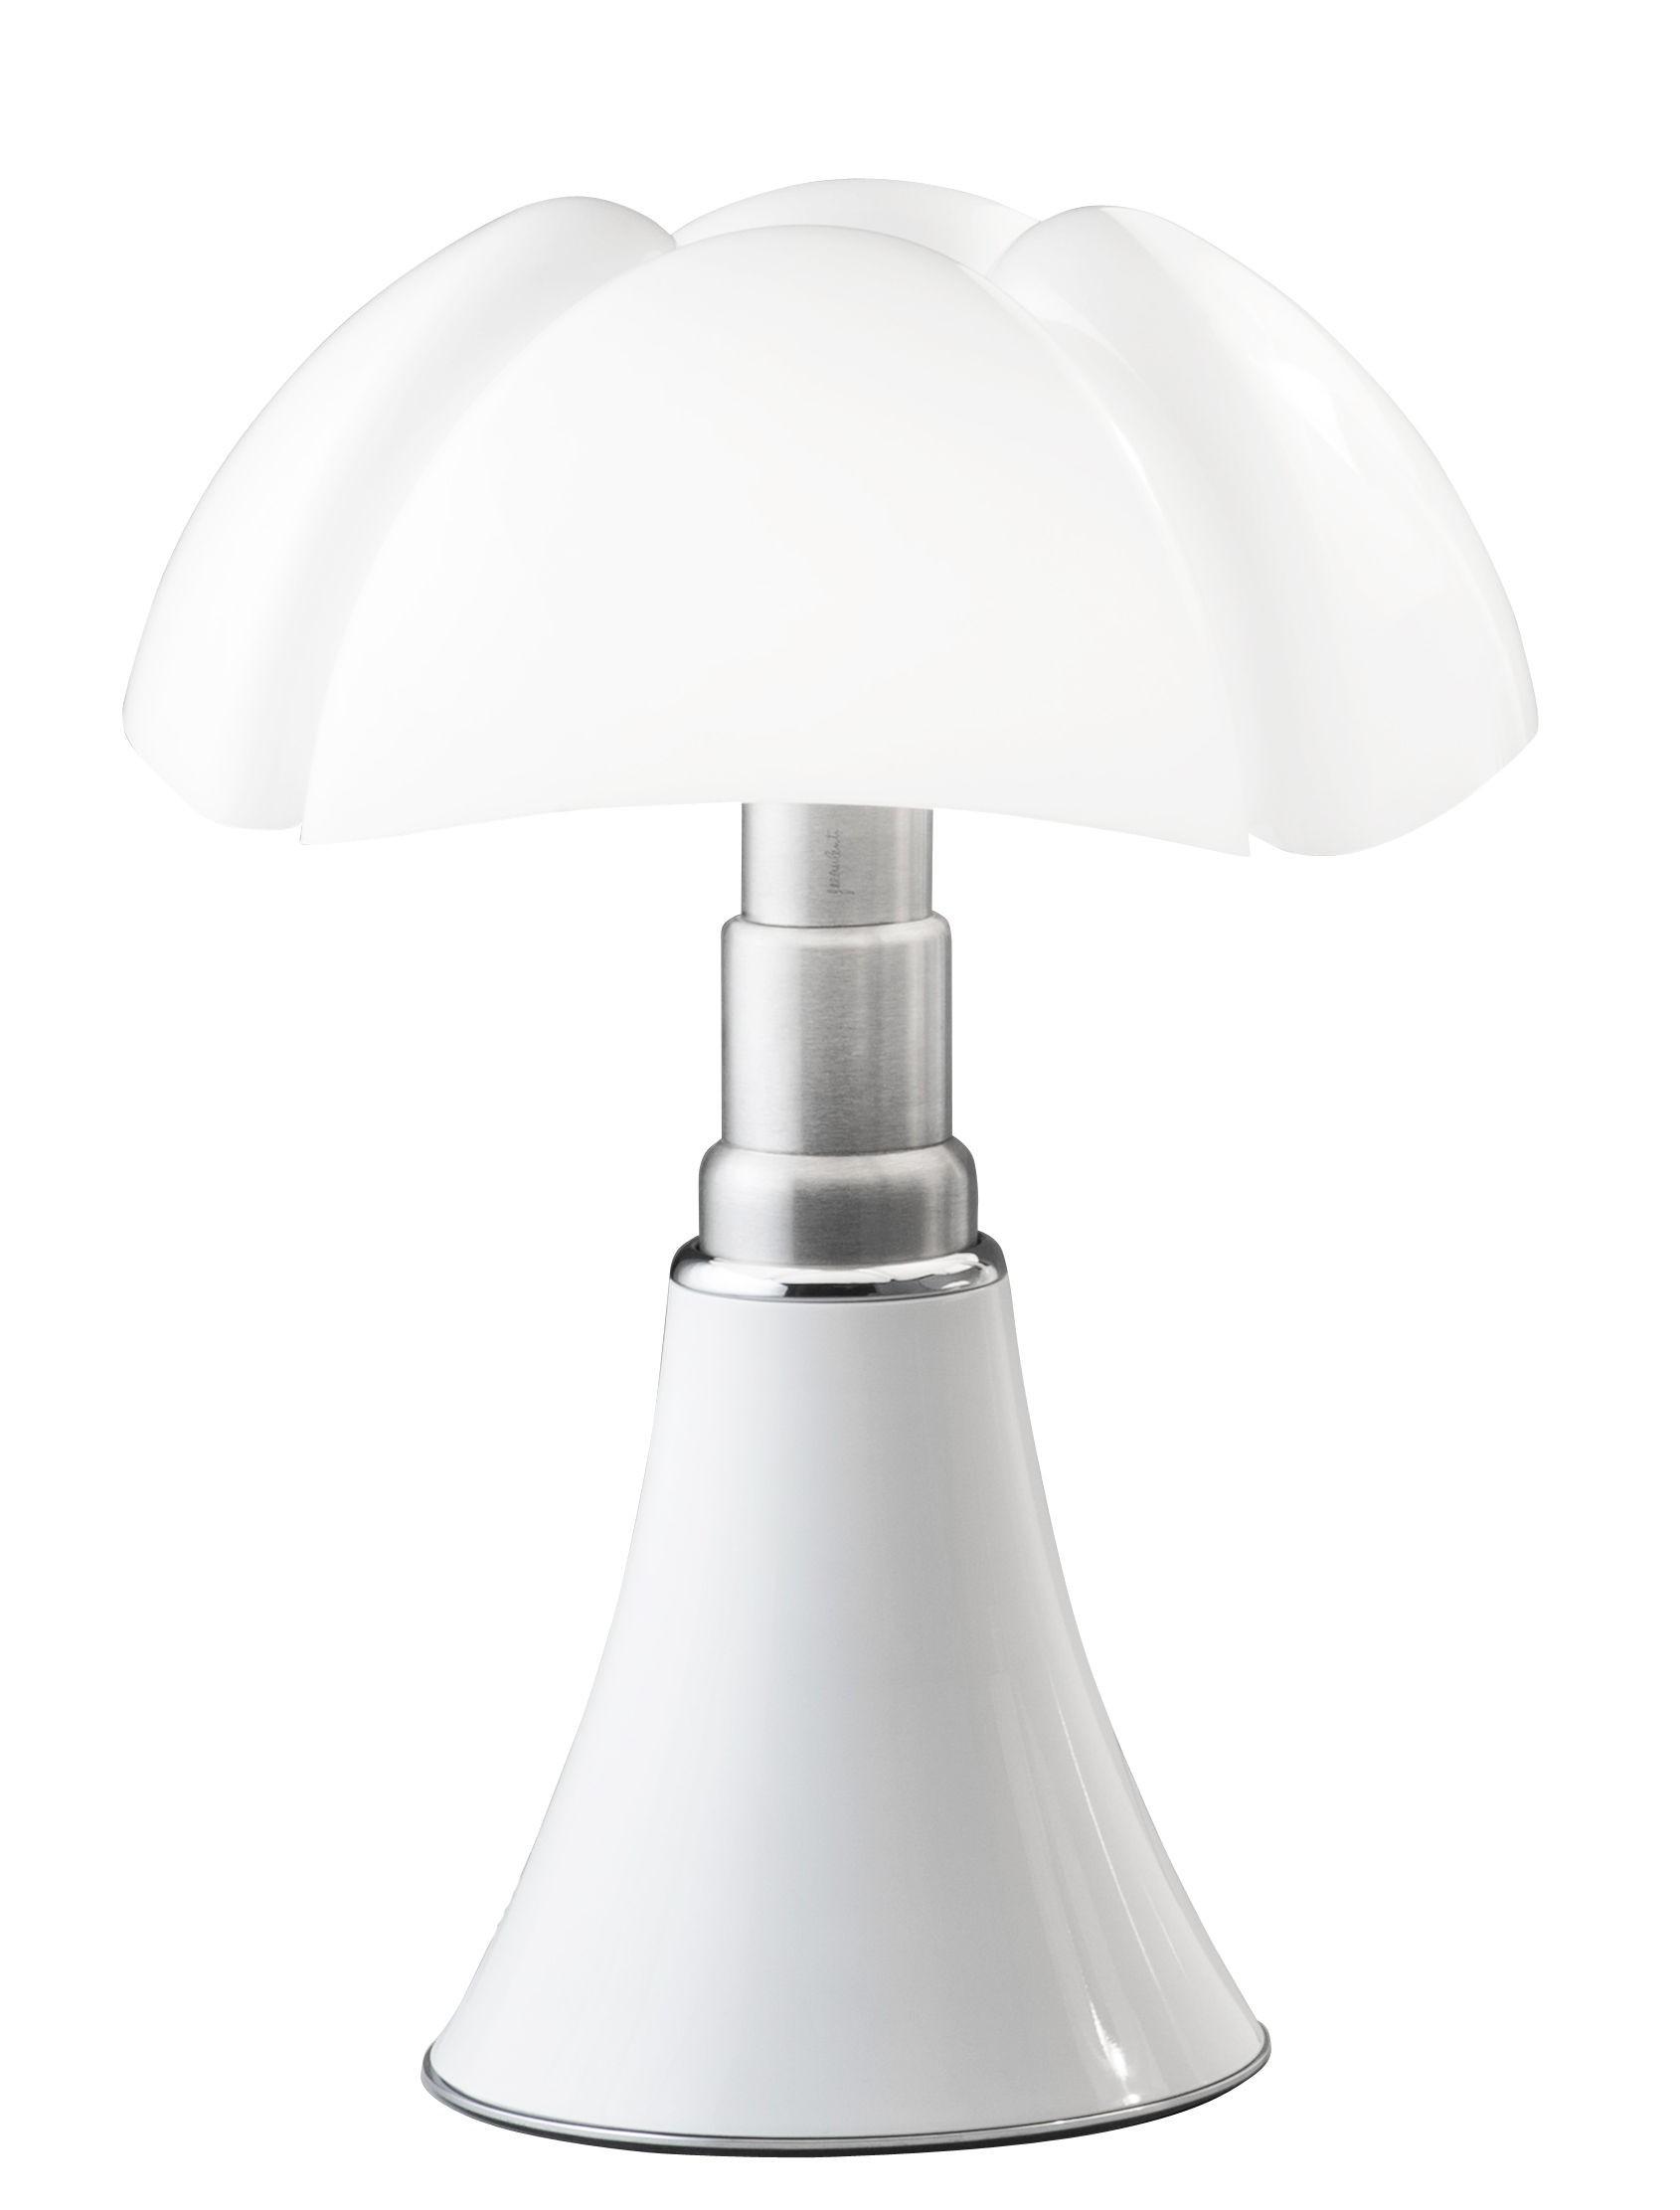 Lampe à poser PIPISTRELLO MEDIUM de Martinelli Luce, Blanc dc0d43fb054e